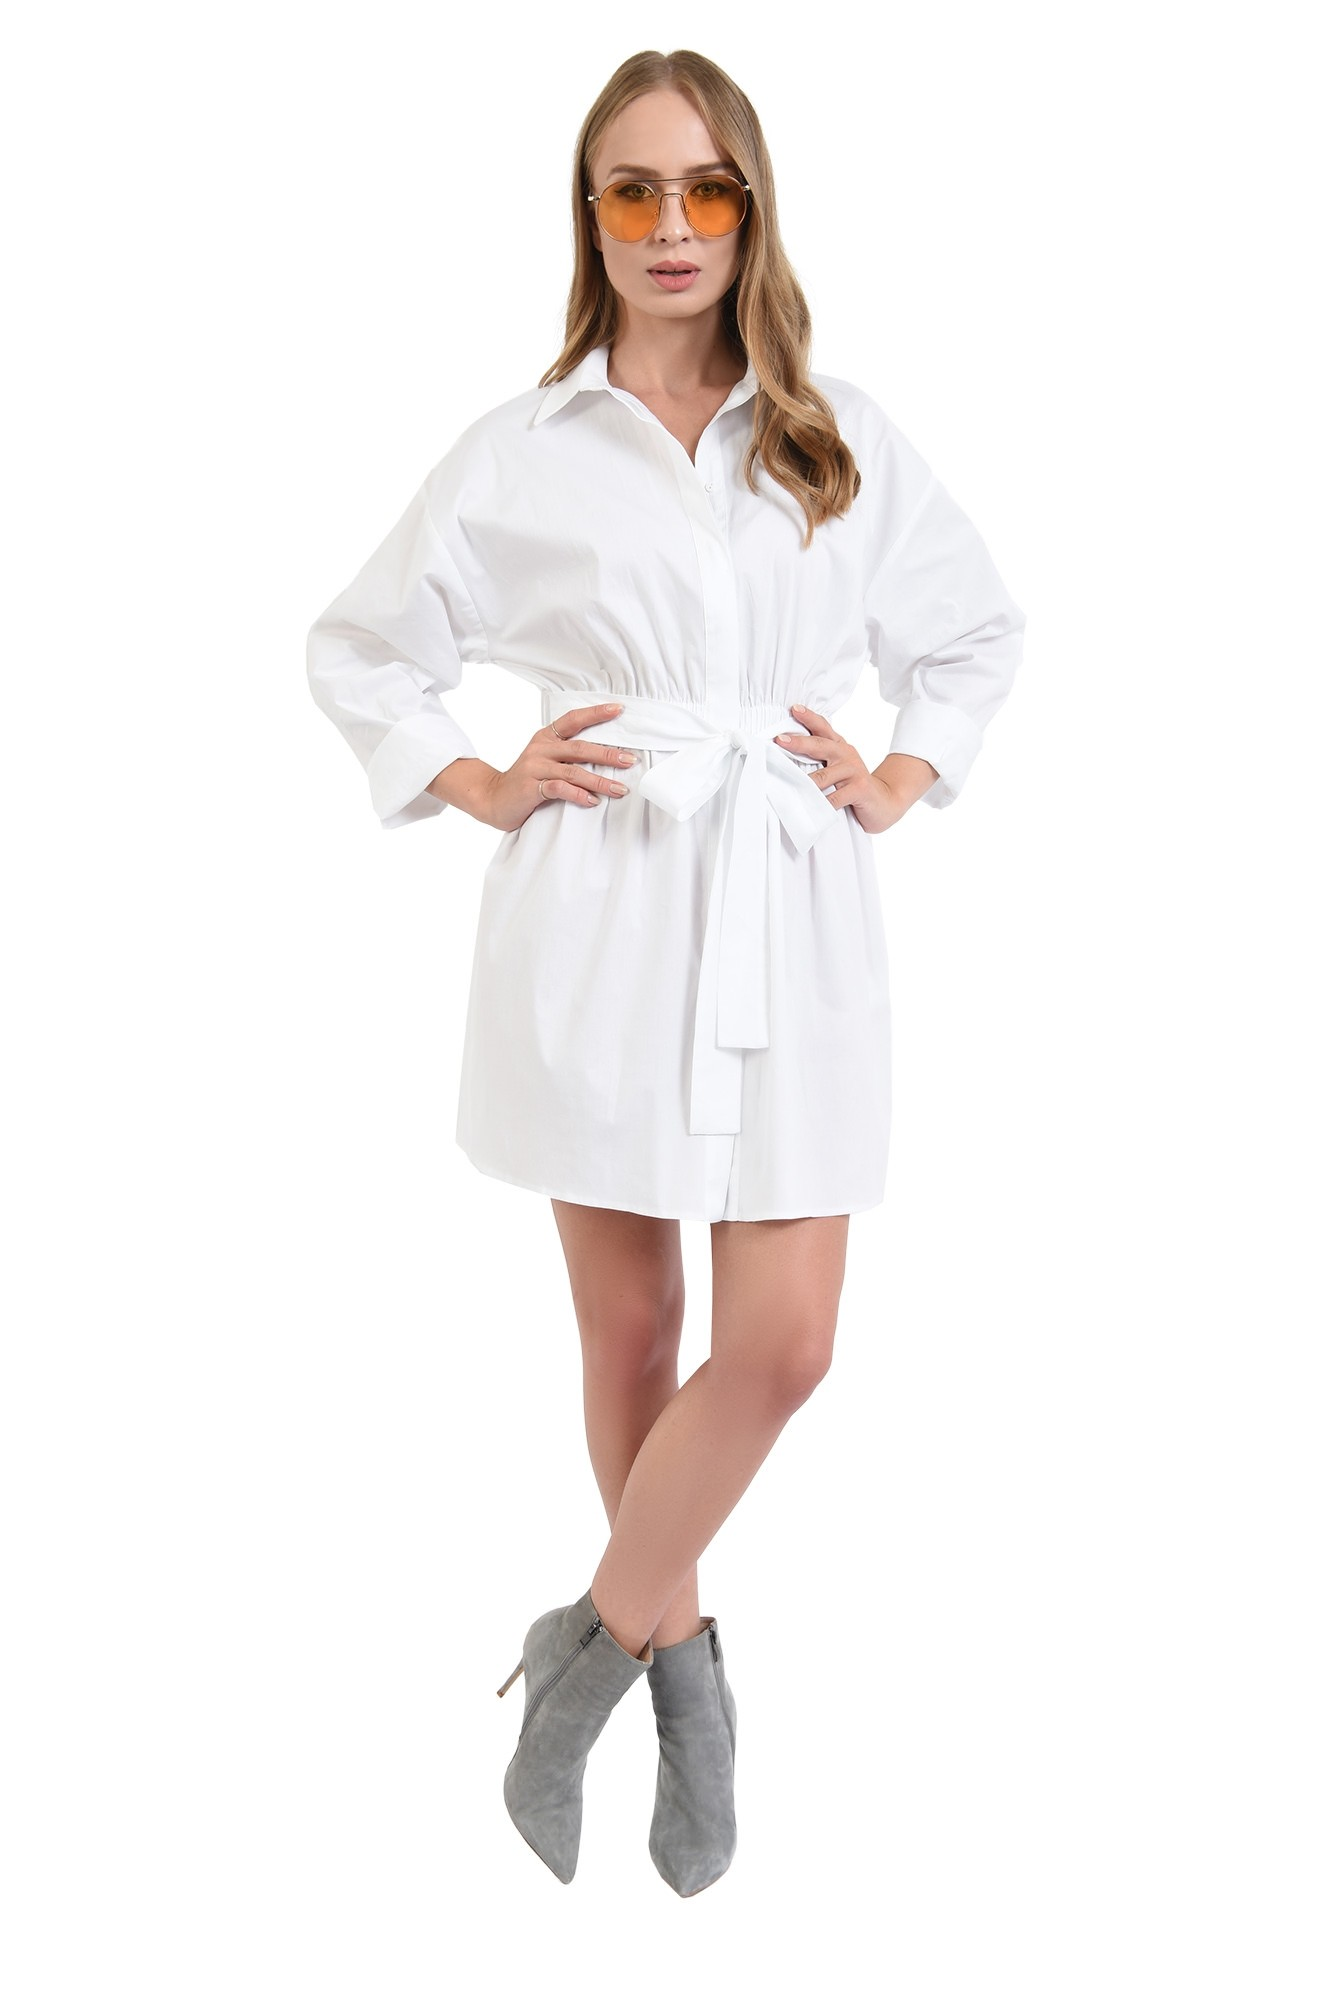 3 - 360 - rochie camasa, mini, cu cordon, nasturi ascunsi, Poema, alb